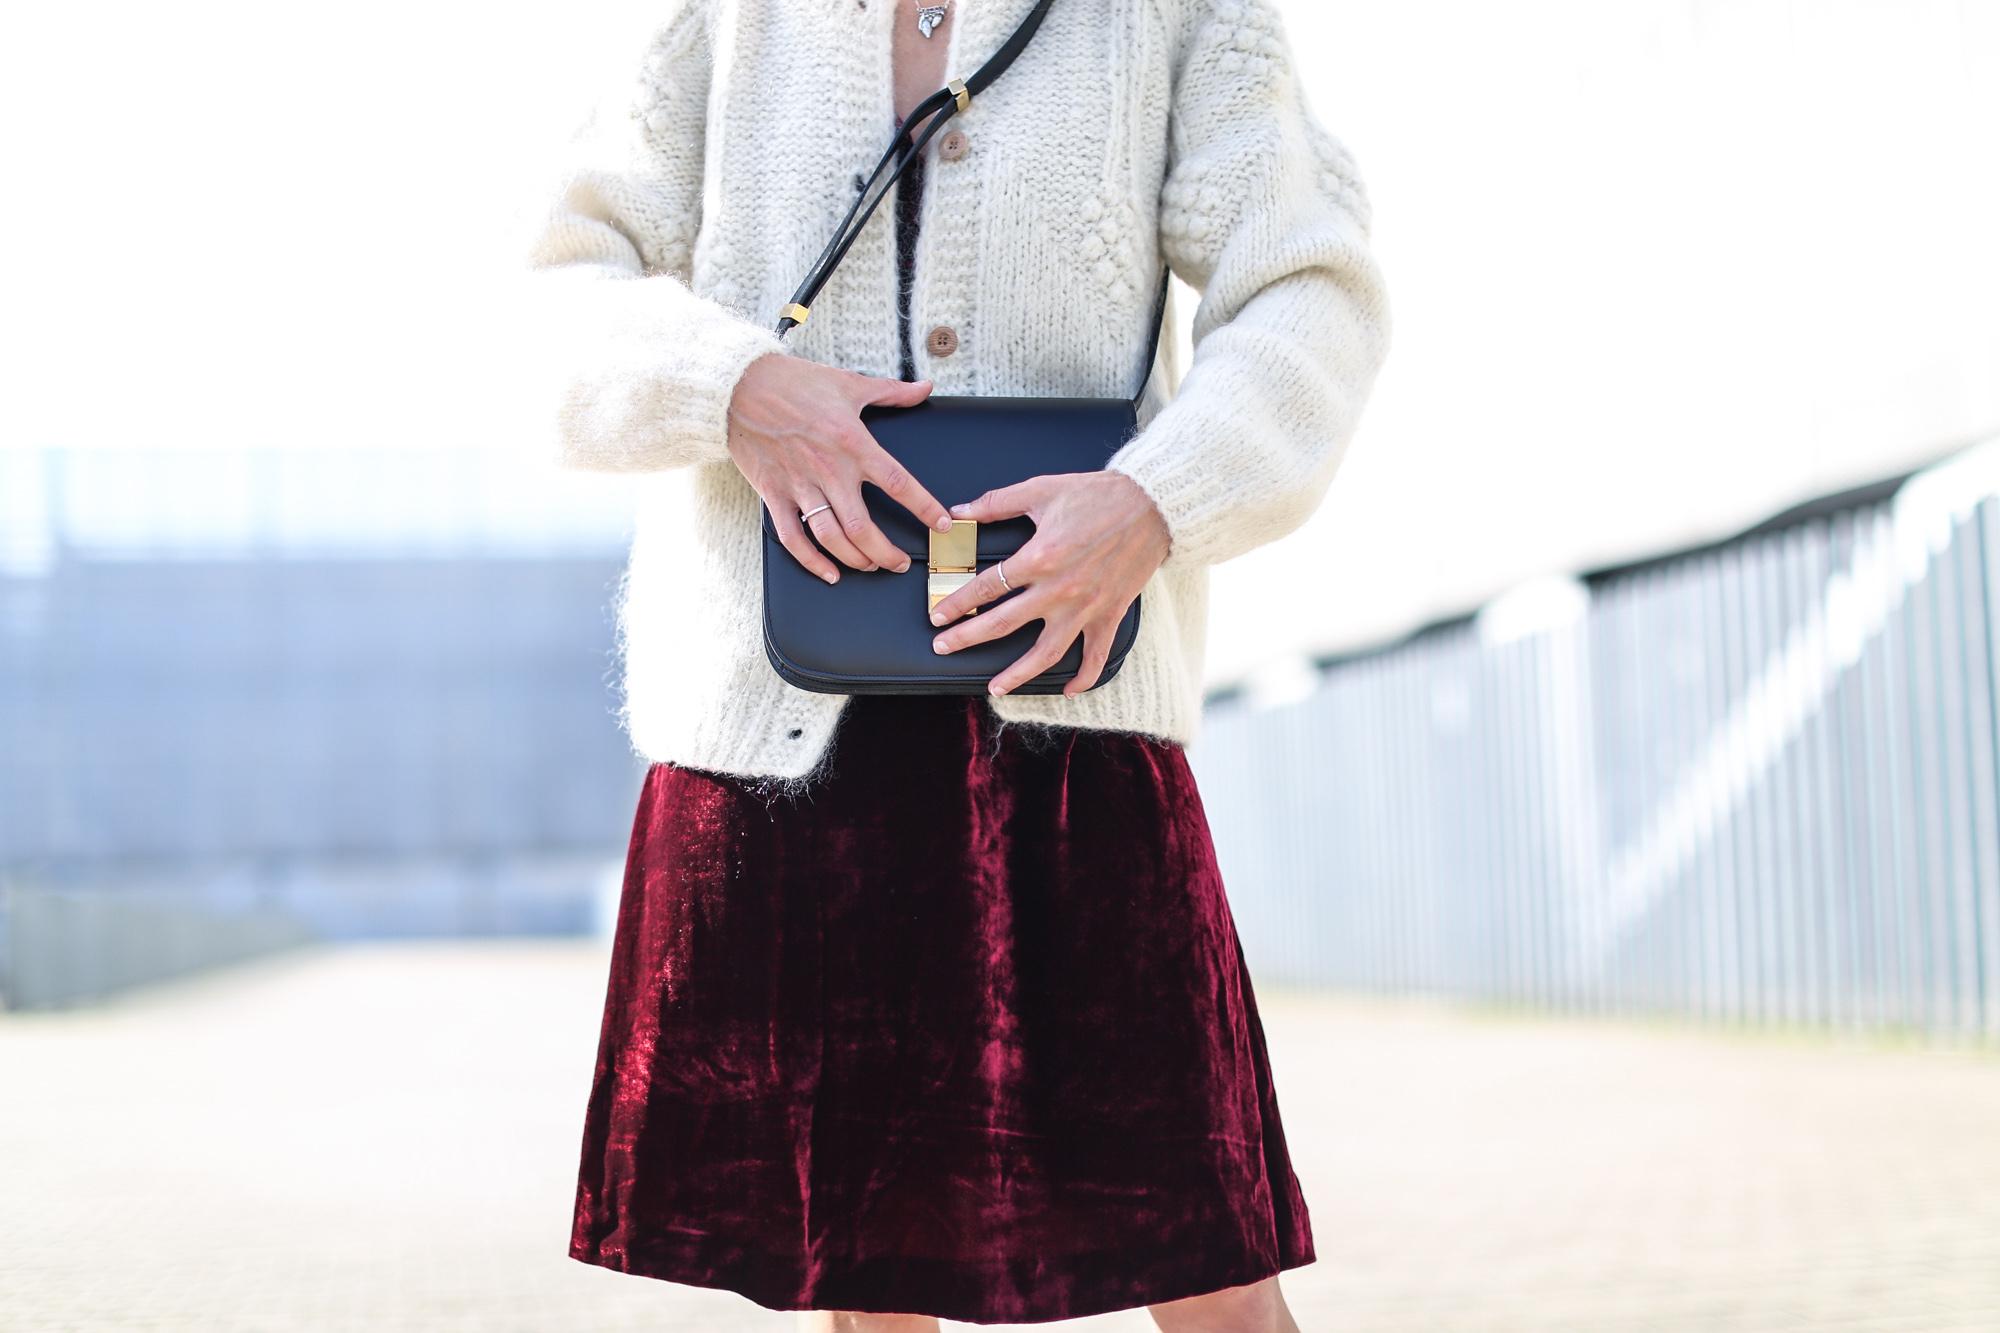 Clochet_streetstyle_fashionblogger_intropia_jerseylanaochosabiertogordito_vestidoterciopelomasscob_adidassambablancas-7